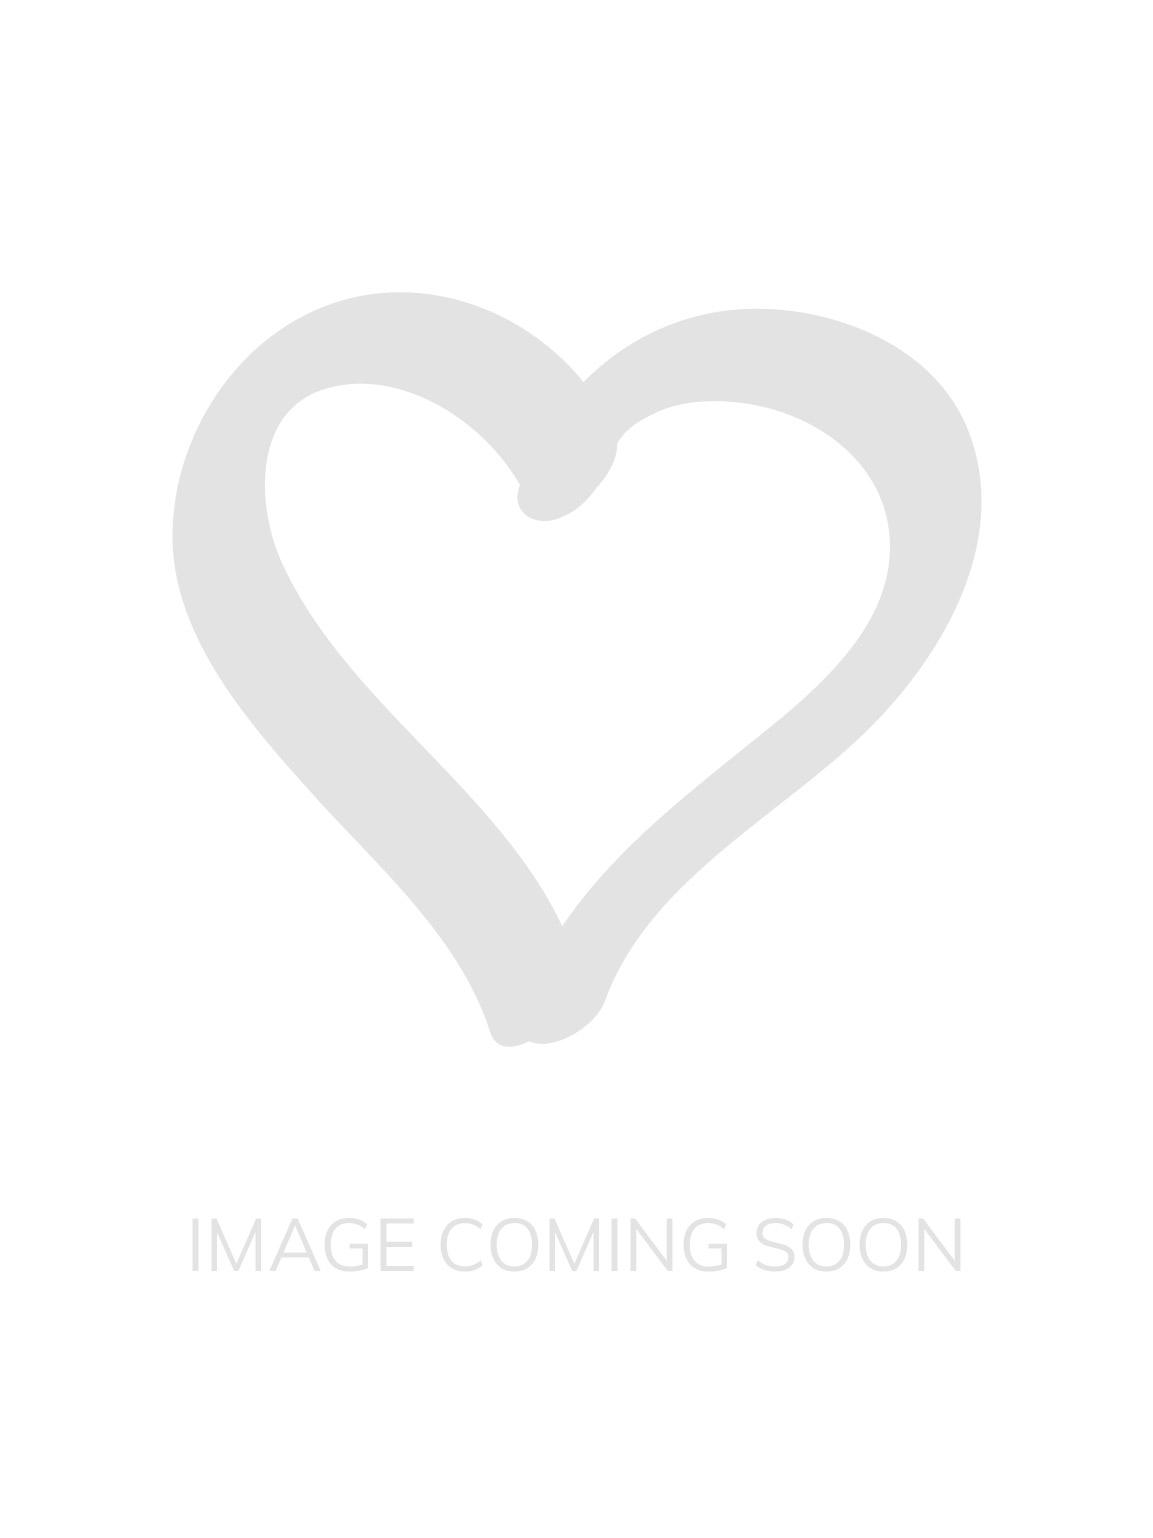 d59504a7ee06e Active Swim Crop Top - Jellybean | Lingerie Outlet Store